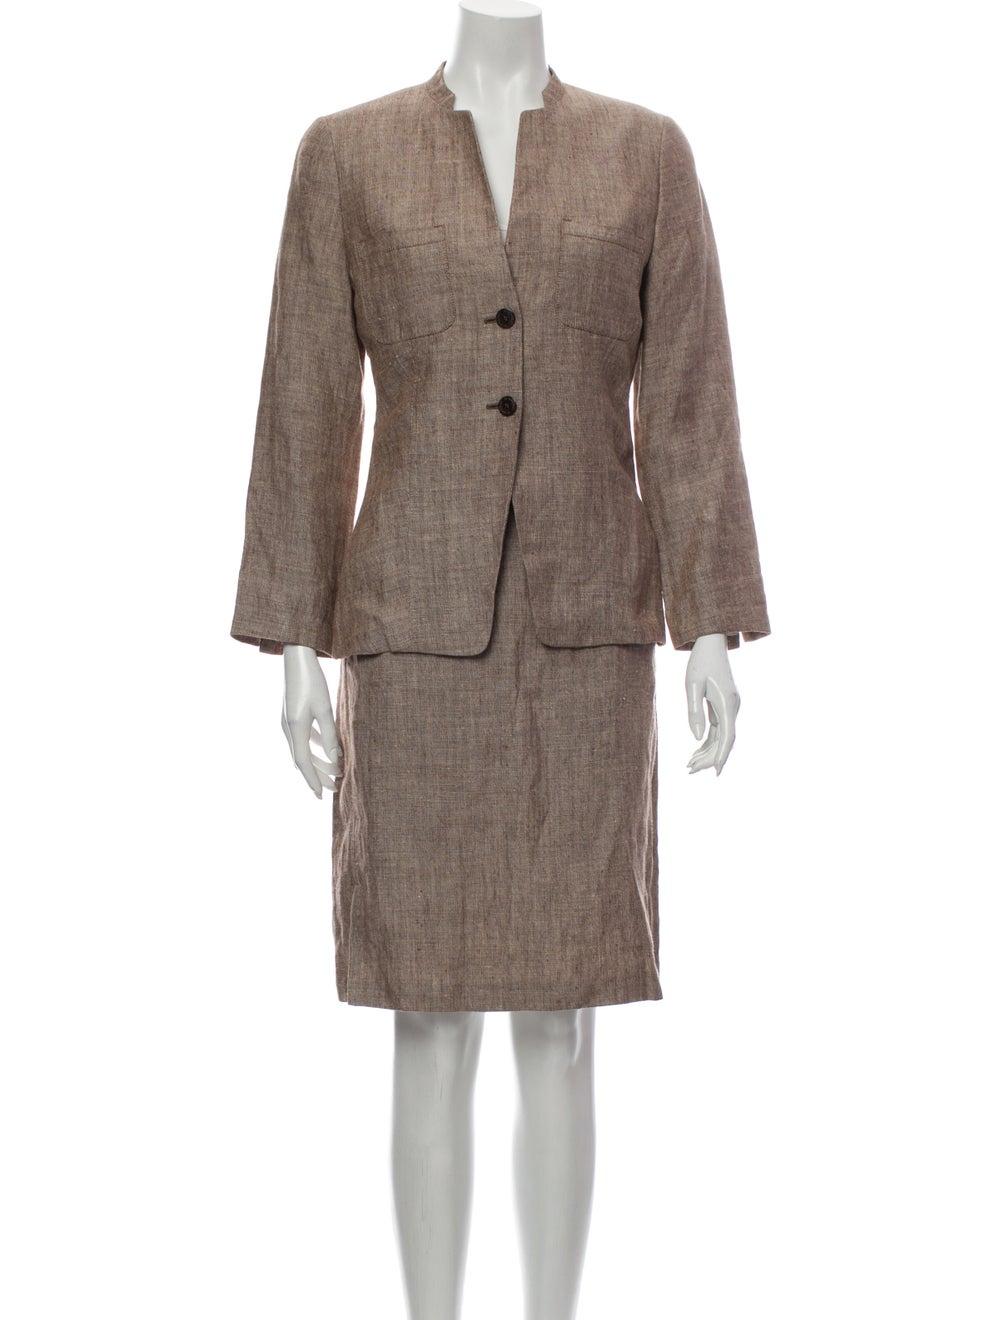 Burberry London Linen Skirt Suit - image 1